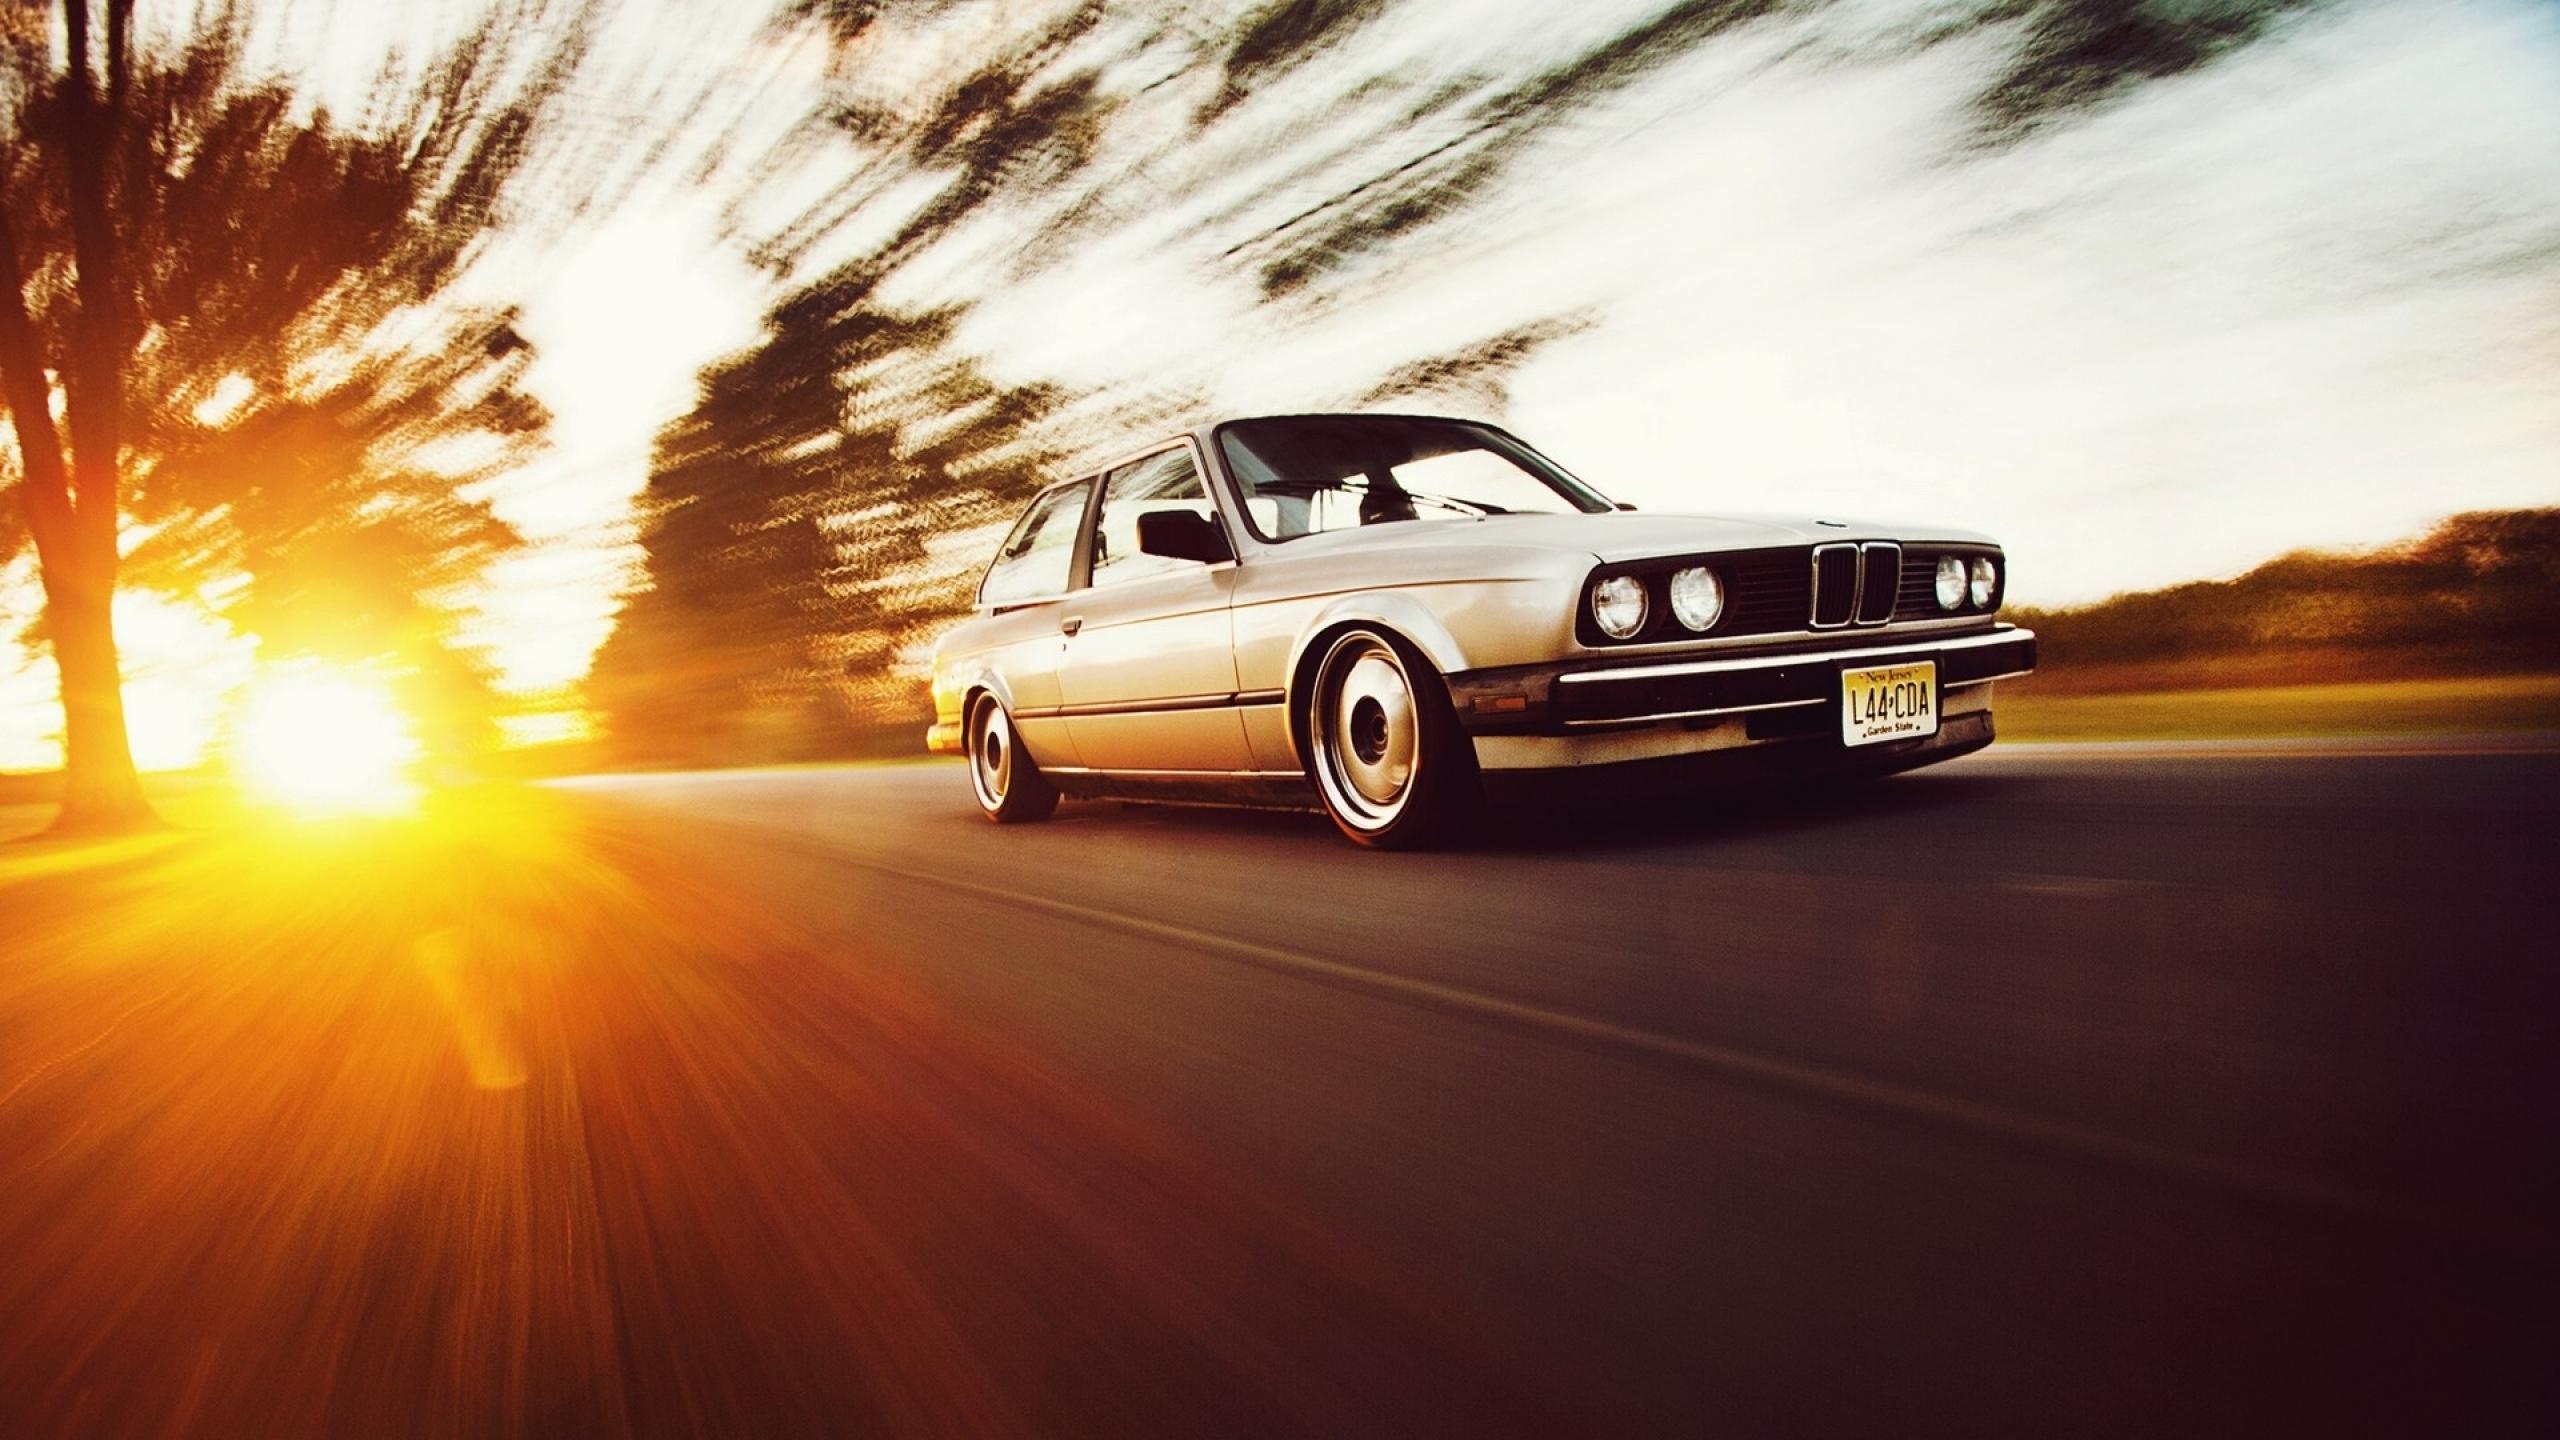 42+ BMW E30 Wallpaper HD on WallpaperSafari